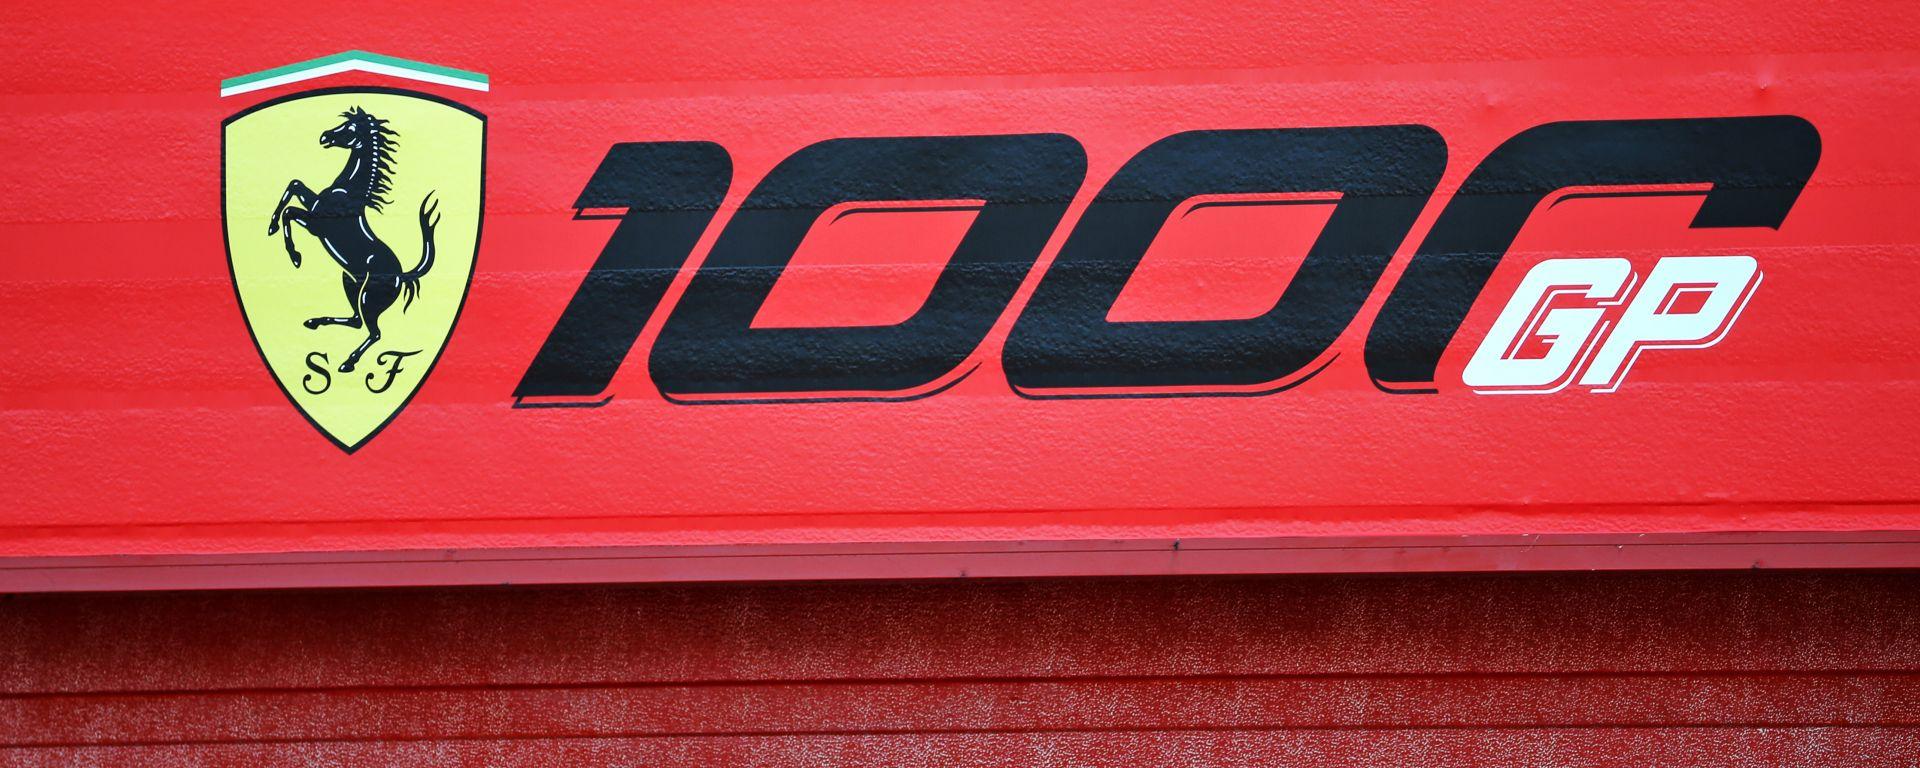 F1, GP Toscana: il logo per i 1000 gran premi Ferrari